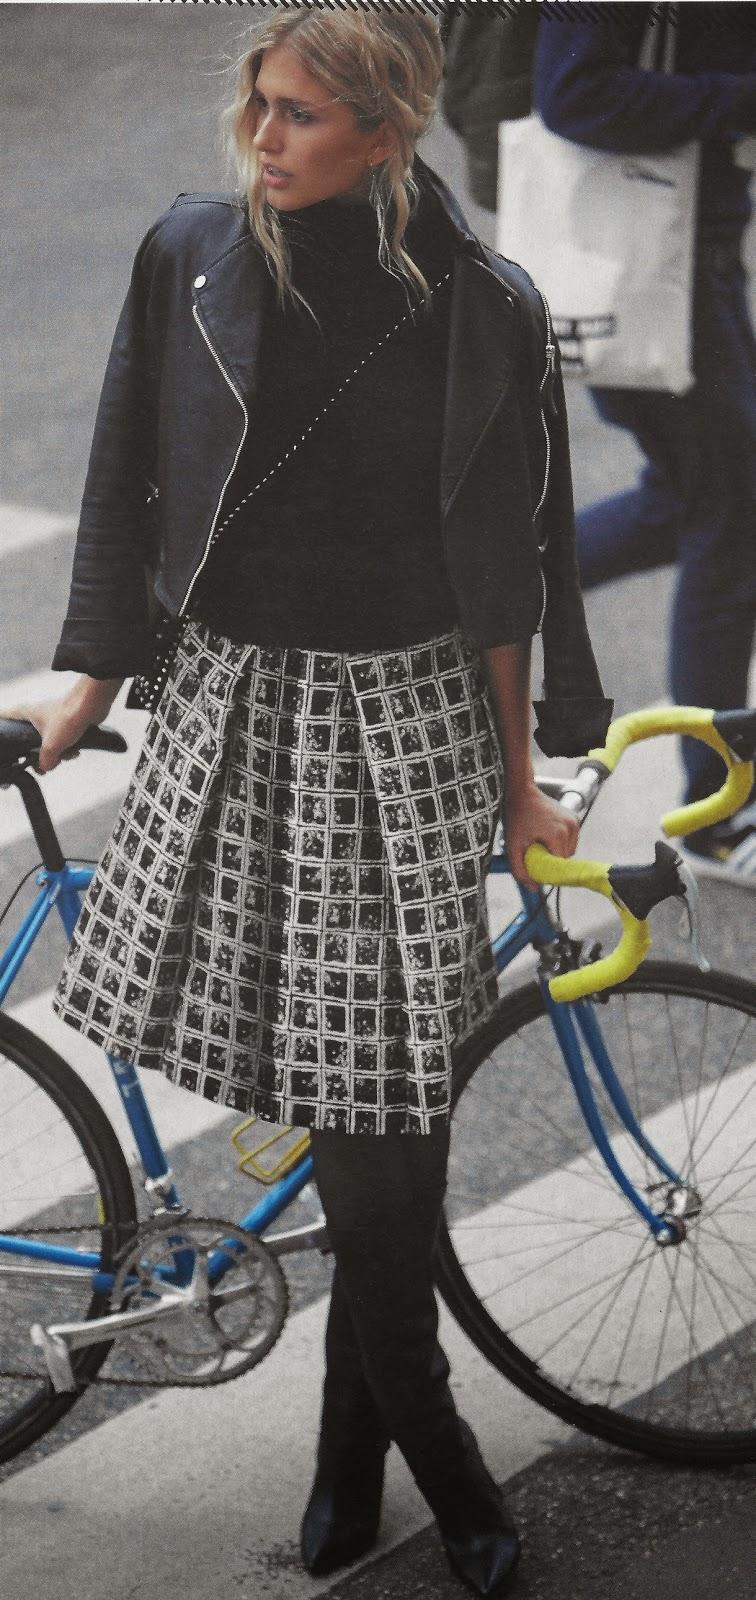 3e20b273fe5 Cute and flirty sheath dress. Dress  108C-Black and White Graphic Ponte  Knit. Julia Roberts in Pretty Women Dress  120-Satin Back Crepe in Deep  Turquoise